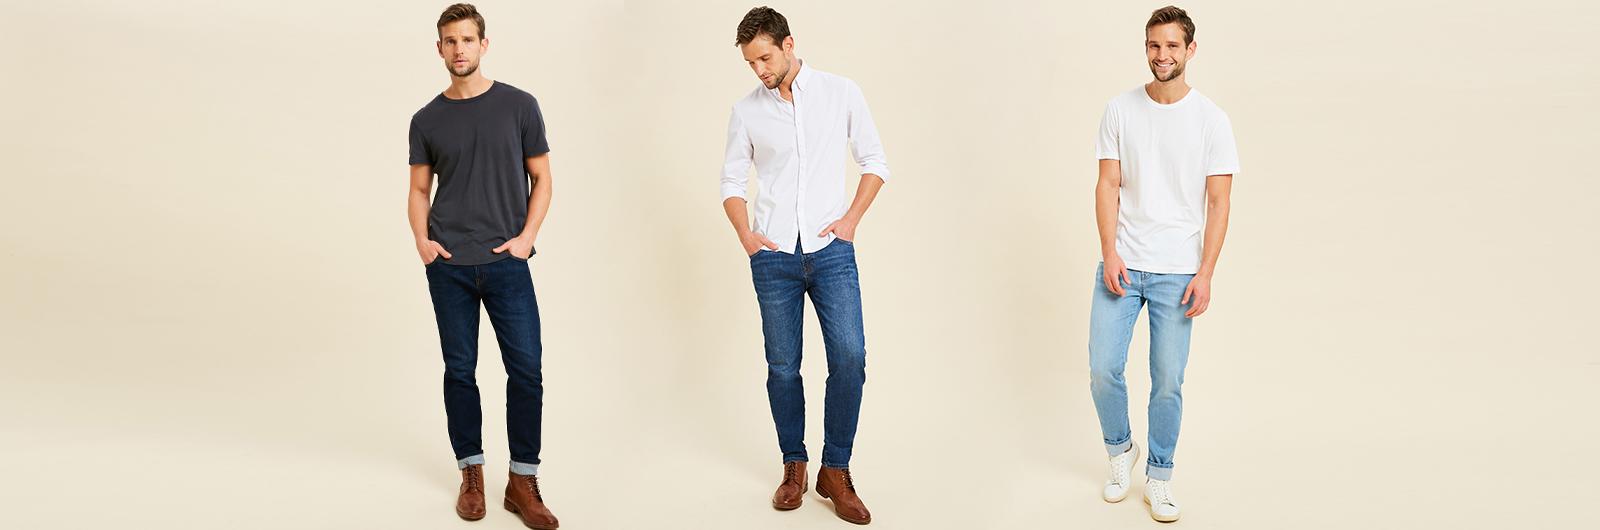 Custom Jeans Delivered to Your Door